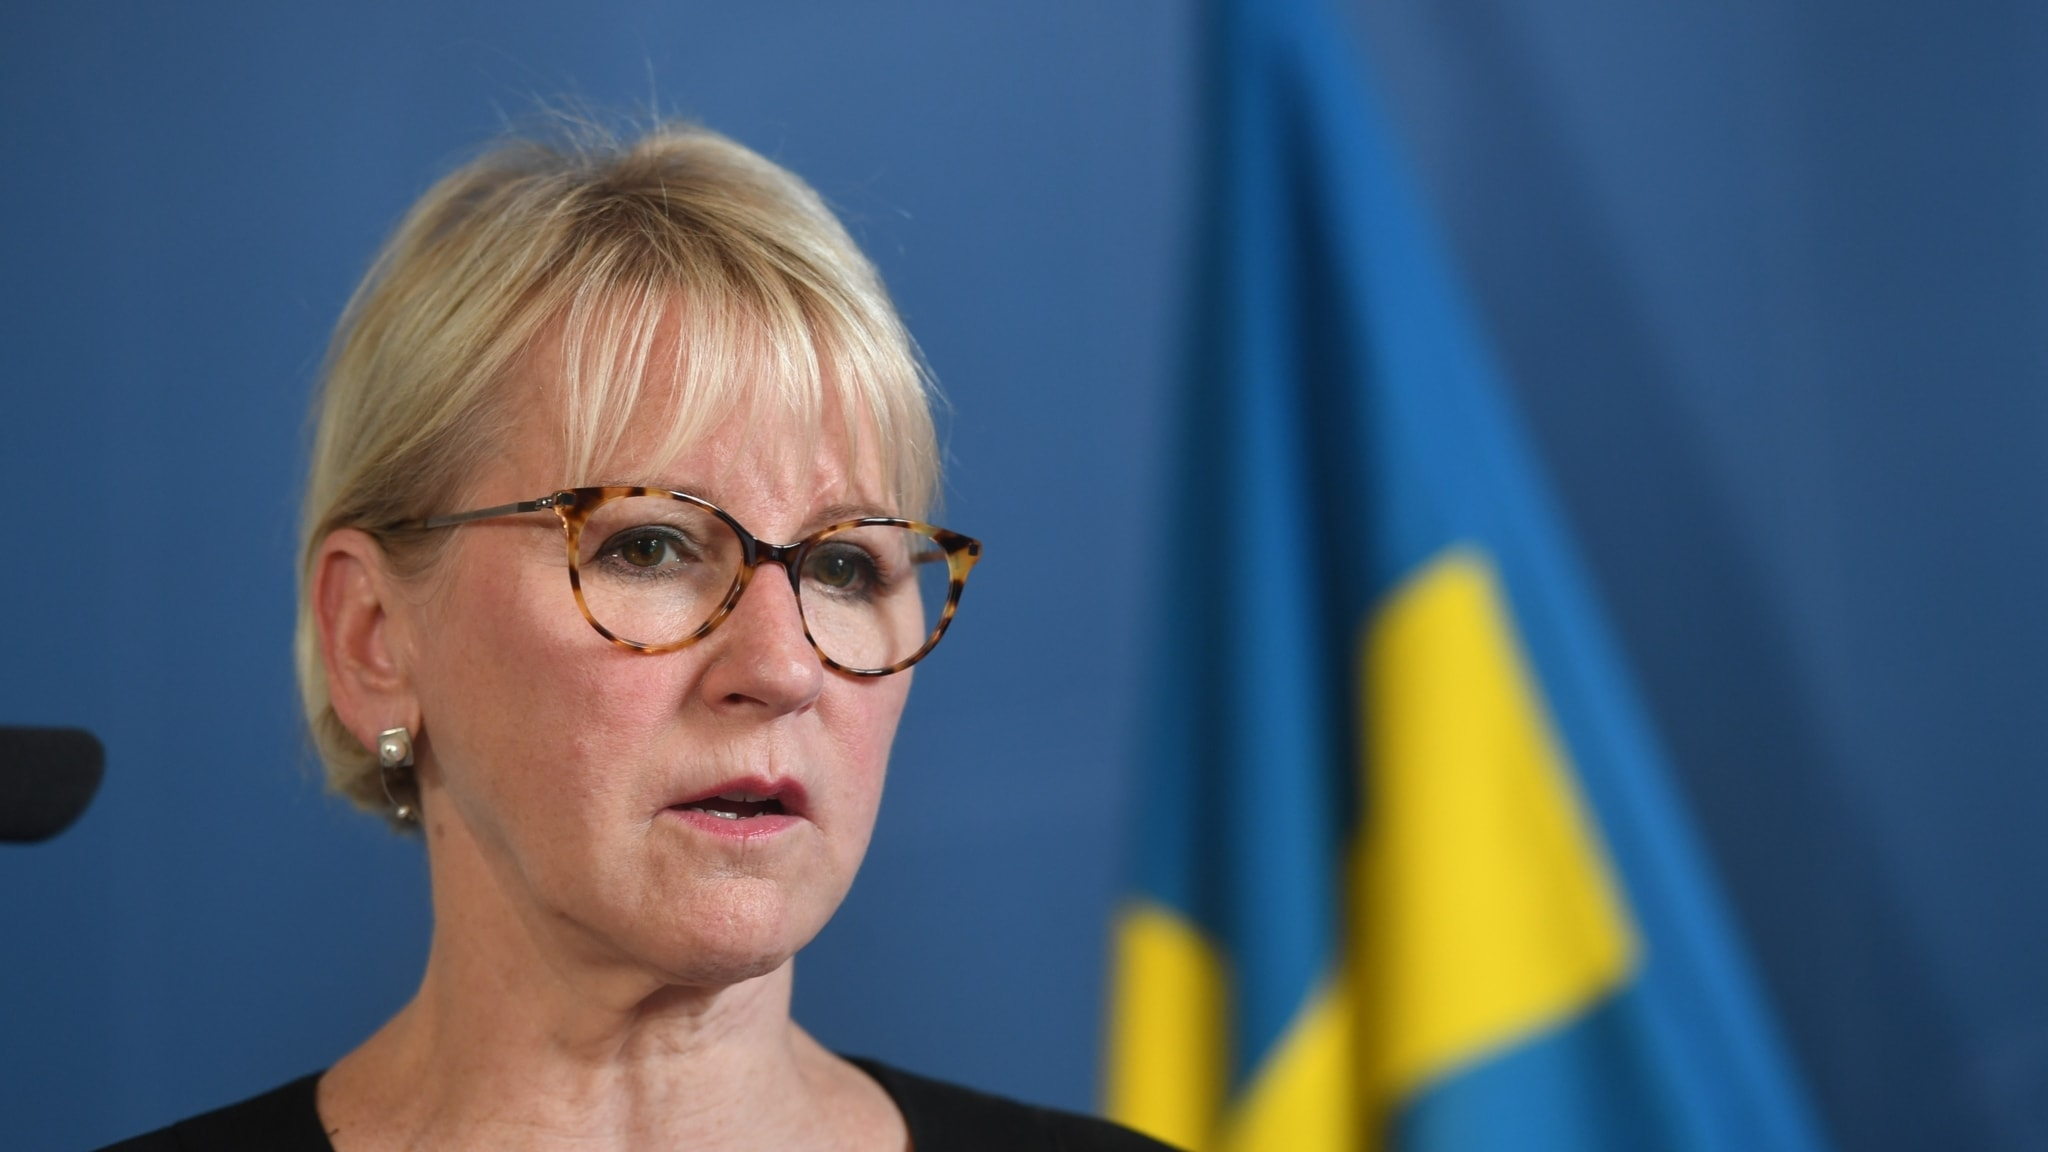 Sverige berett ta emot batflyktingar